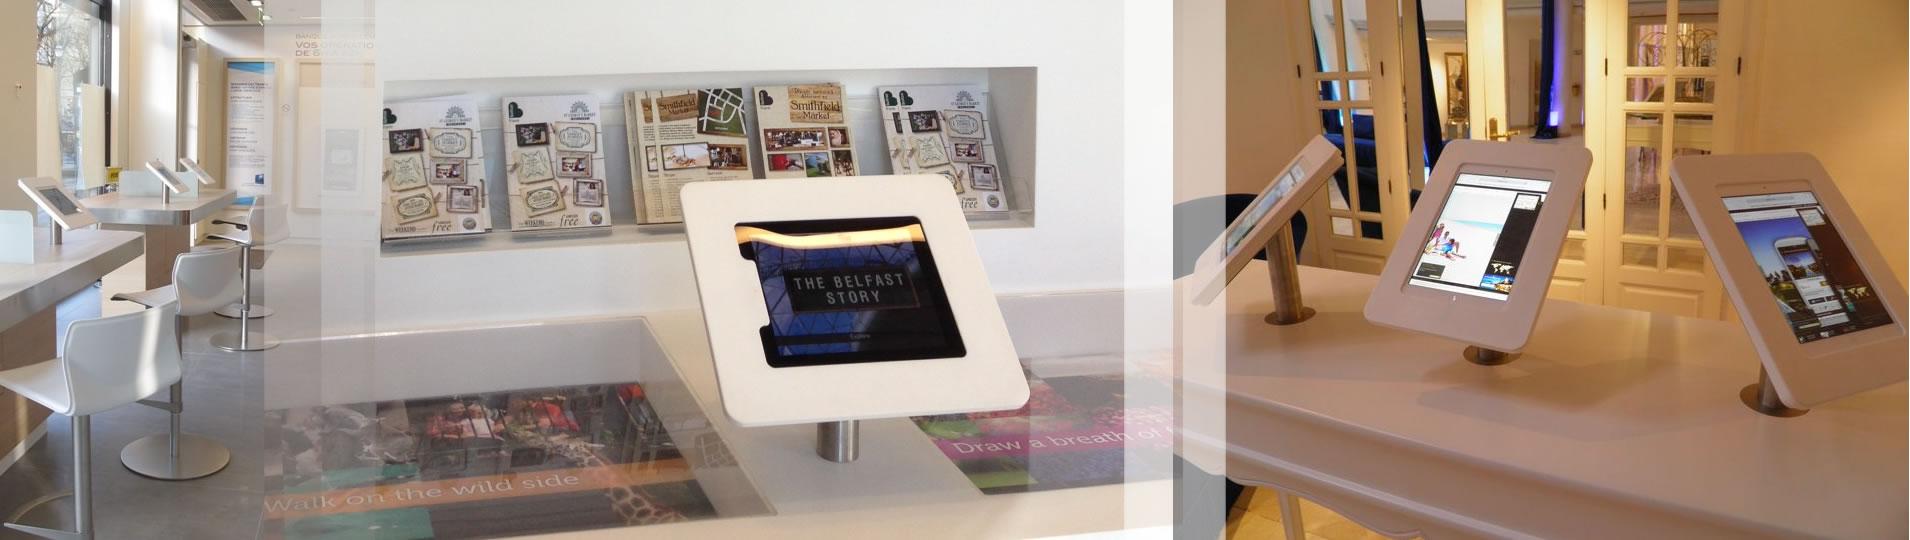 Spreekgestoelten tv standaards ipad standaards - Tv standaard huis ter wereld ...